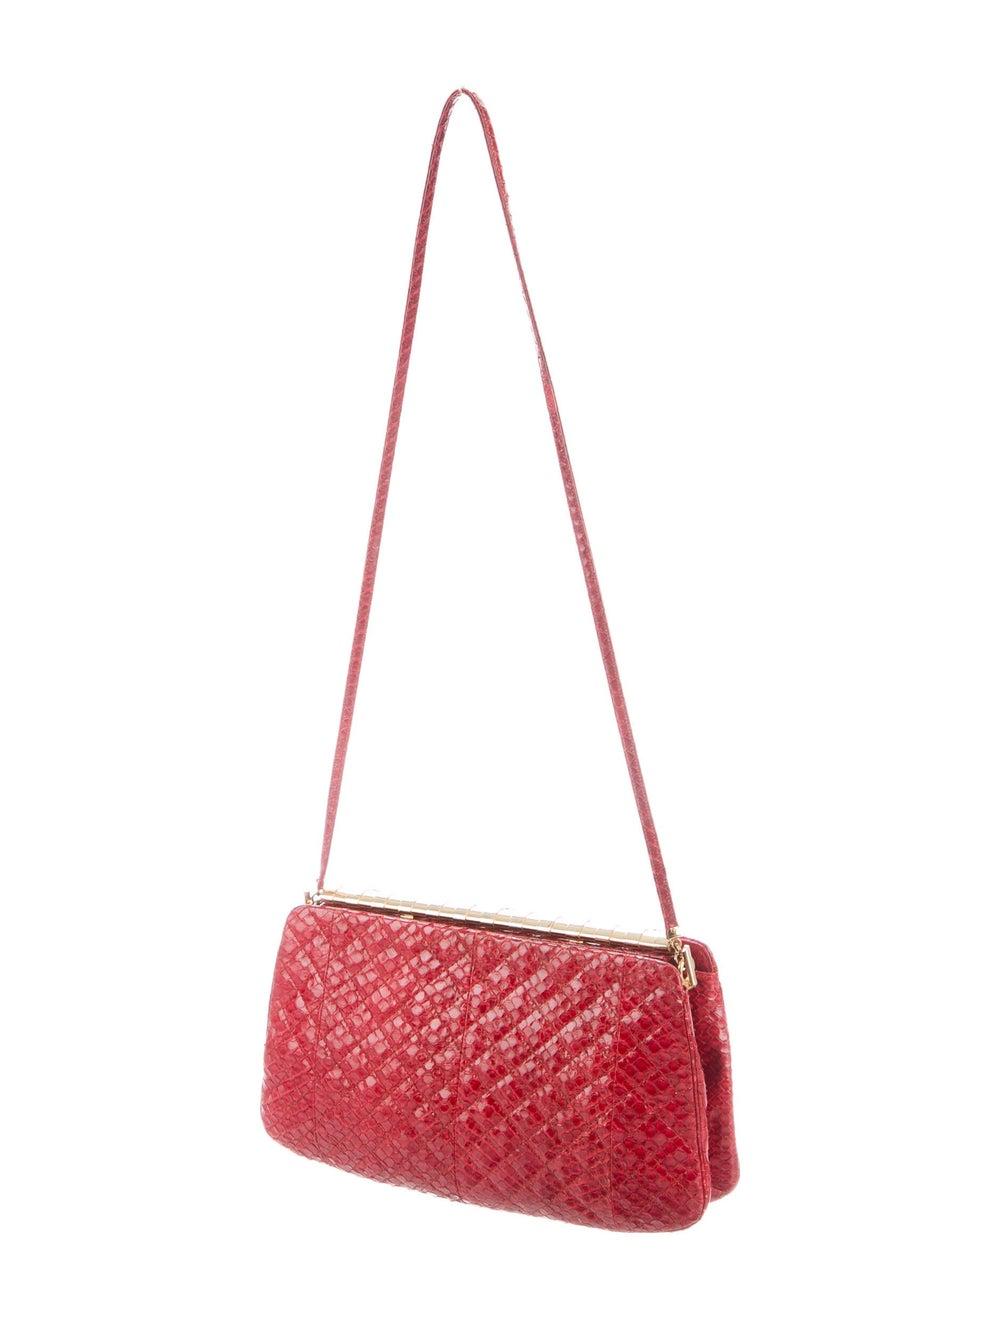 Judith Leiber Snakeskin Evening Bag Red - image 3